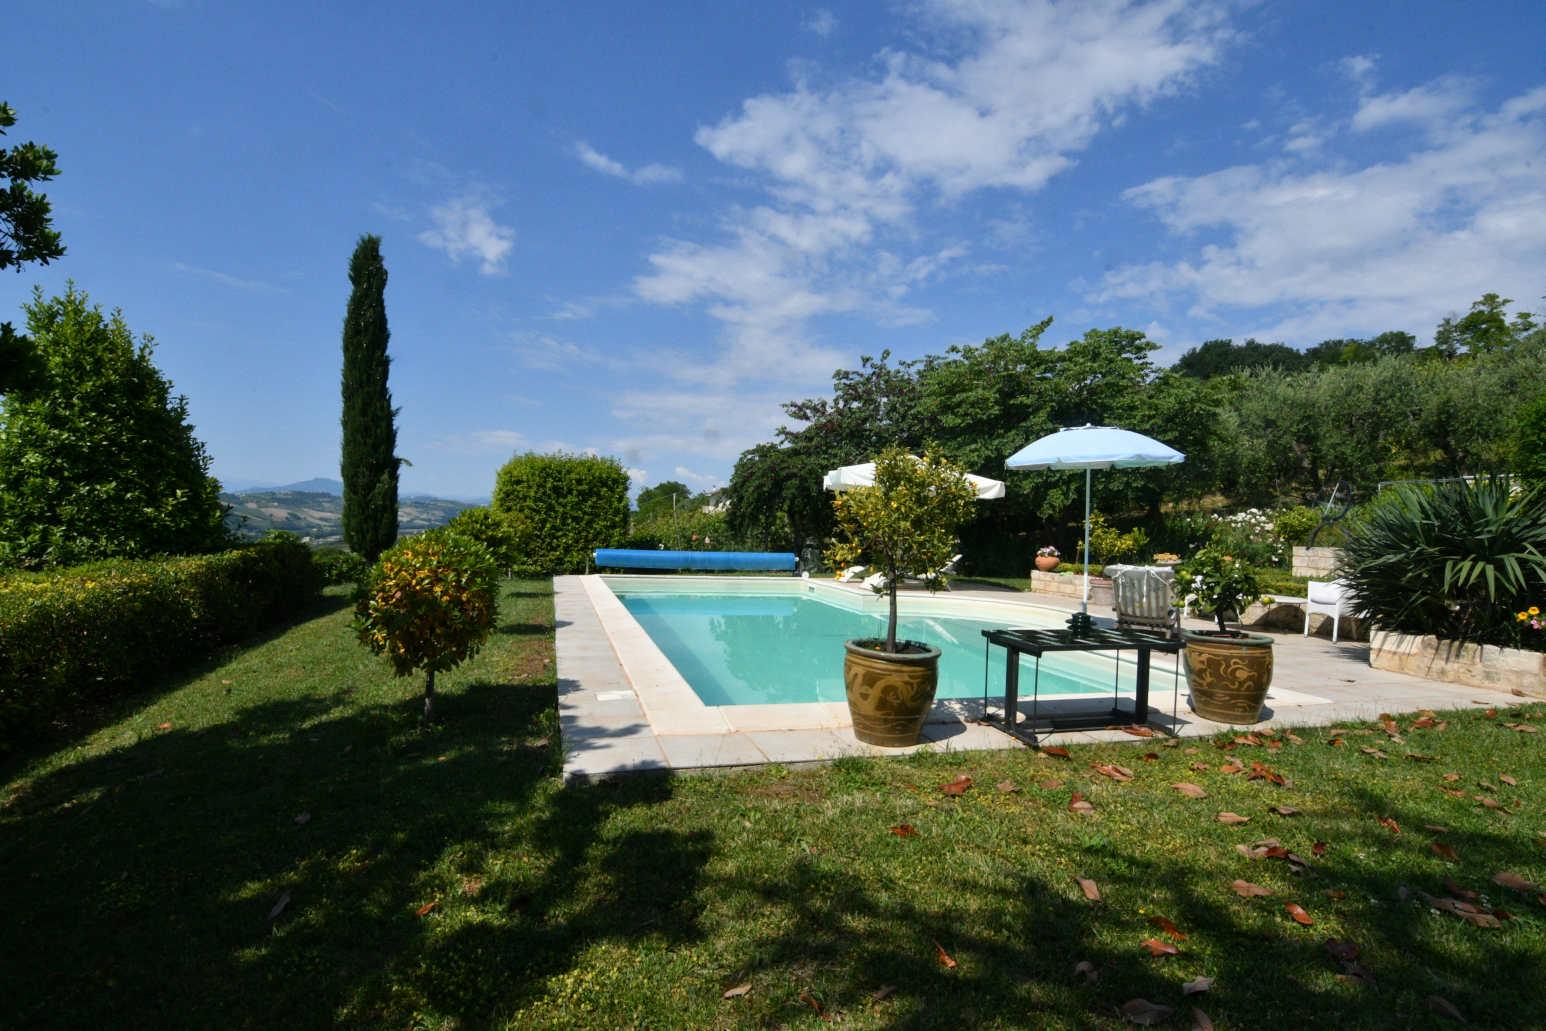 Villa with pool in Le marche